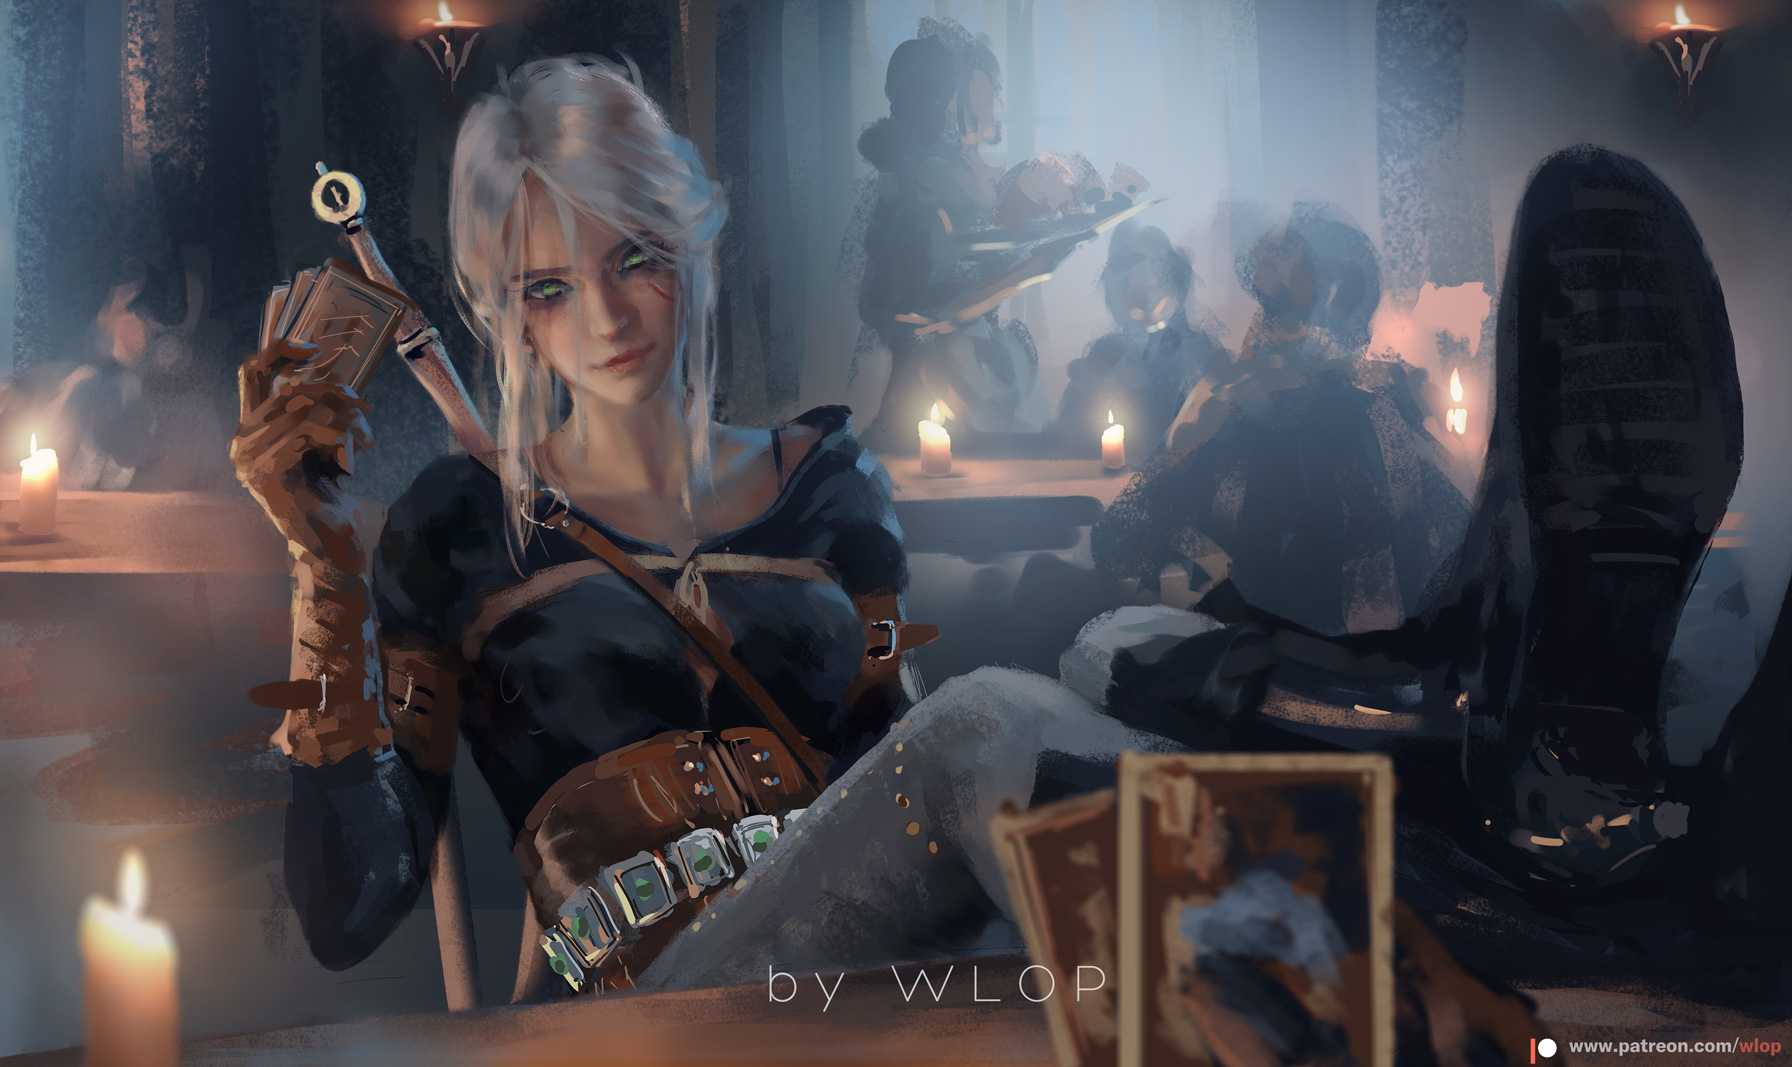 Strong female character Cirilla Fiona Elen Riannon of the witcher saga